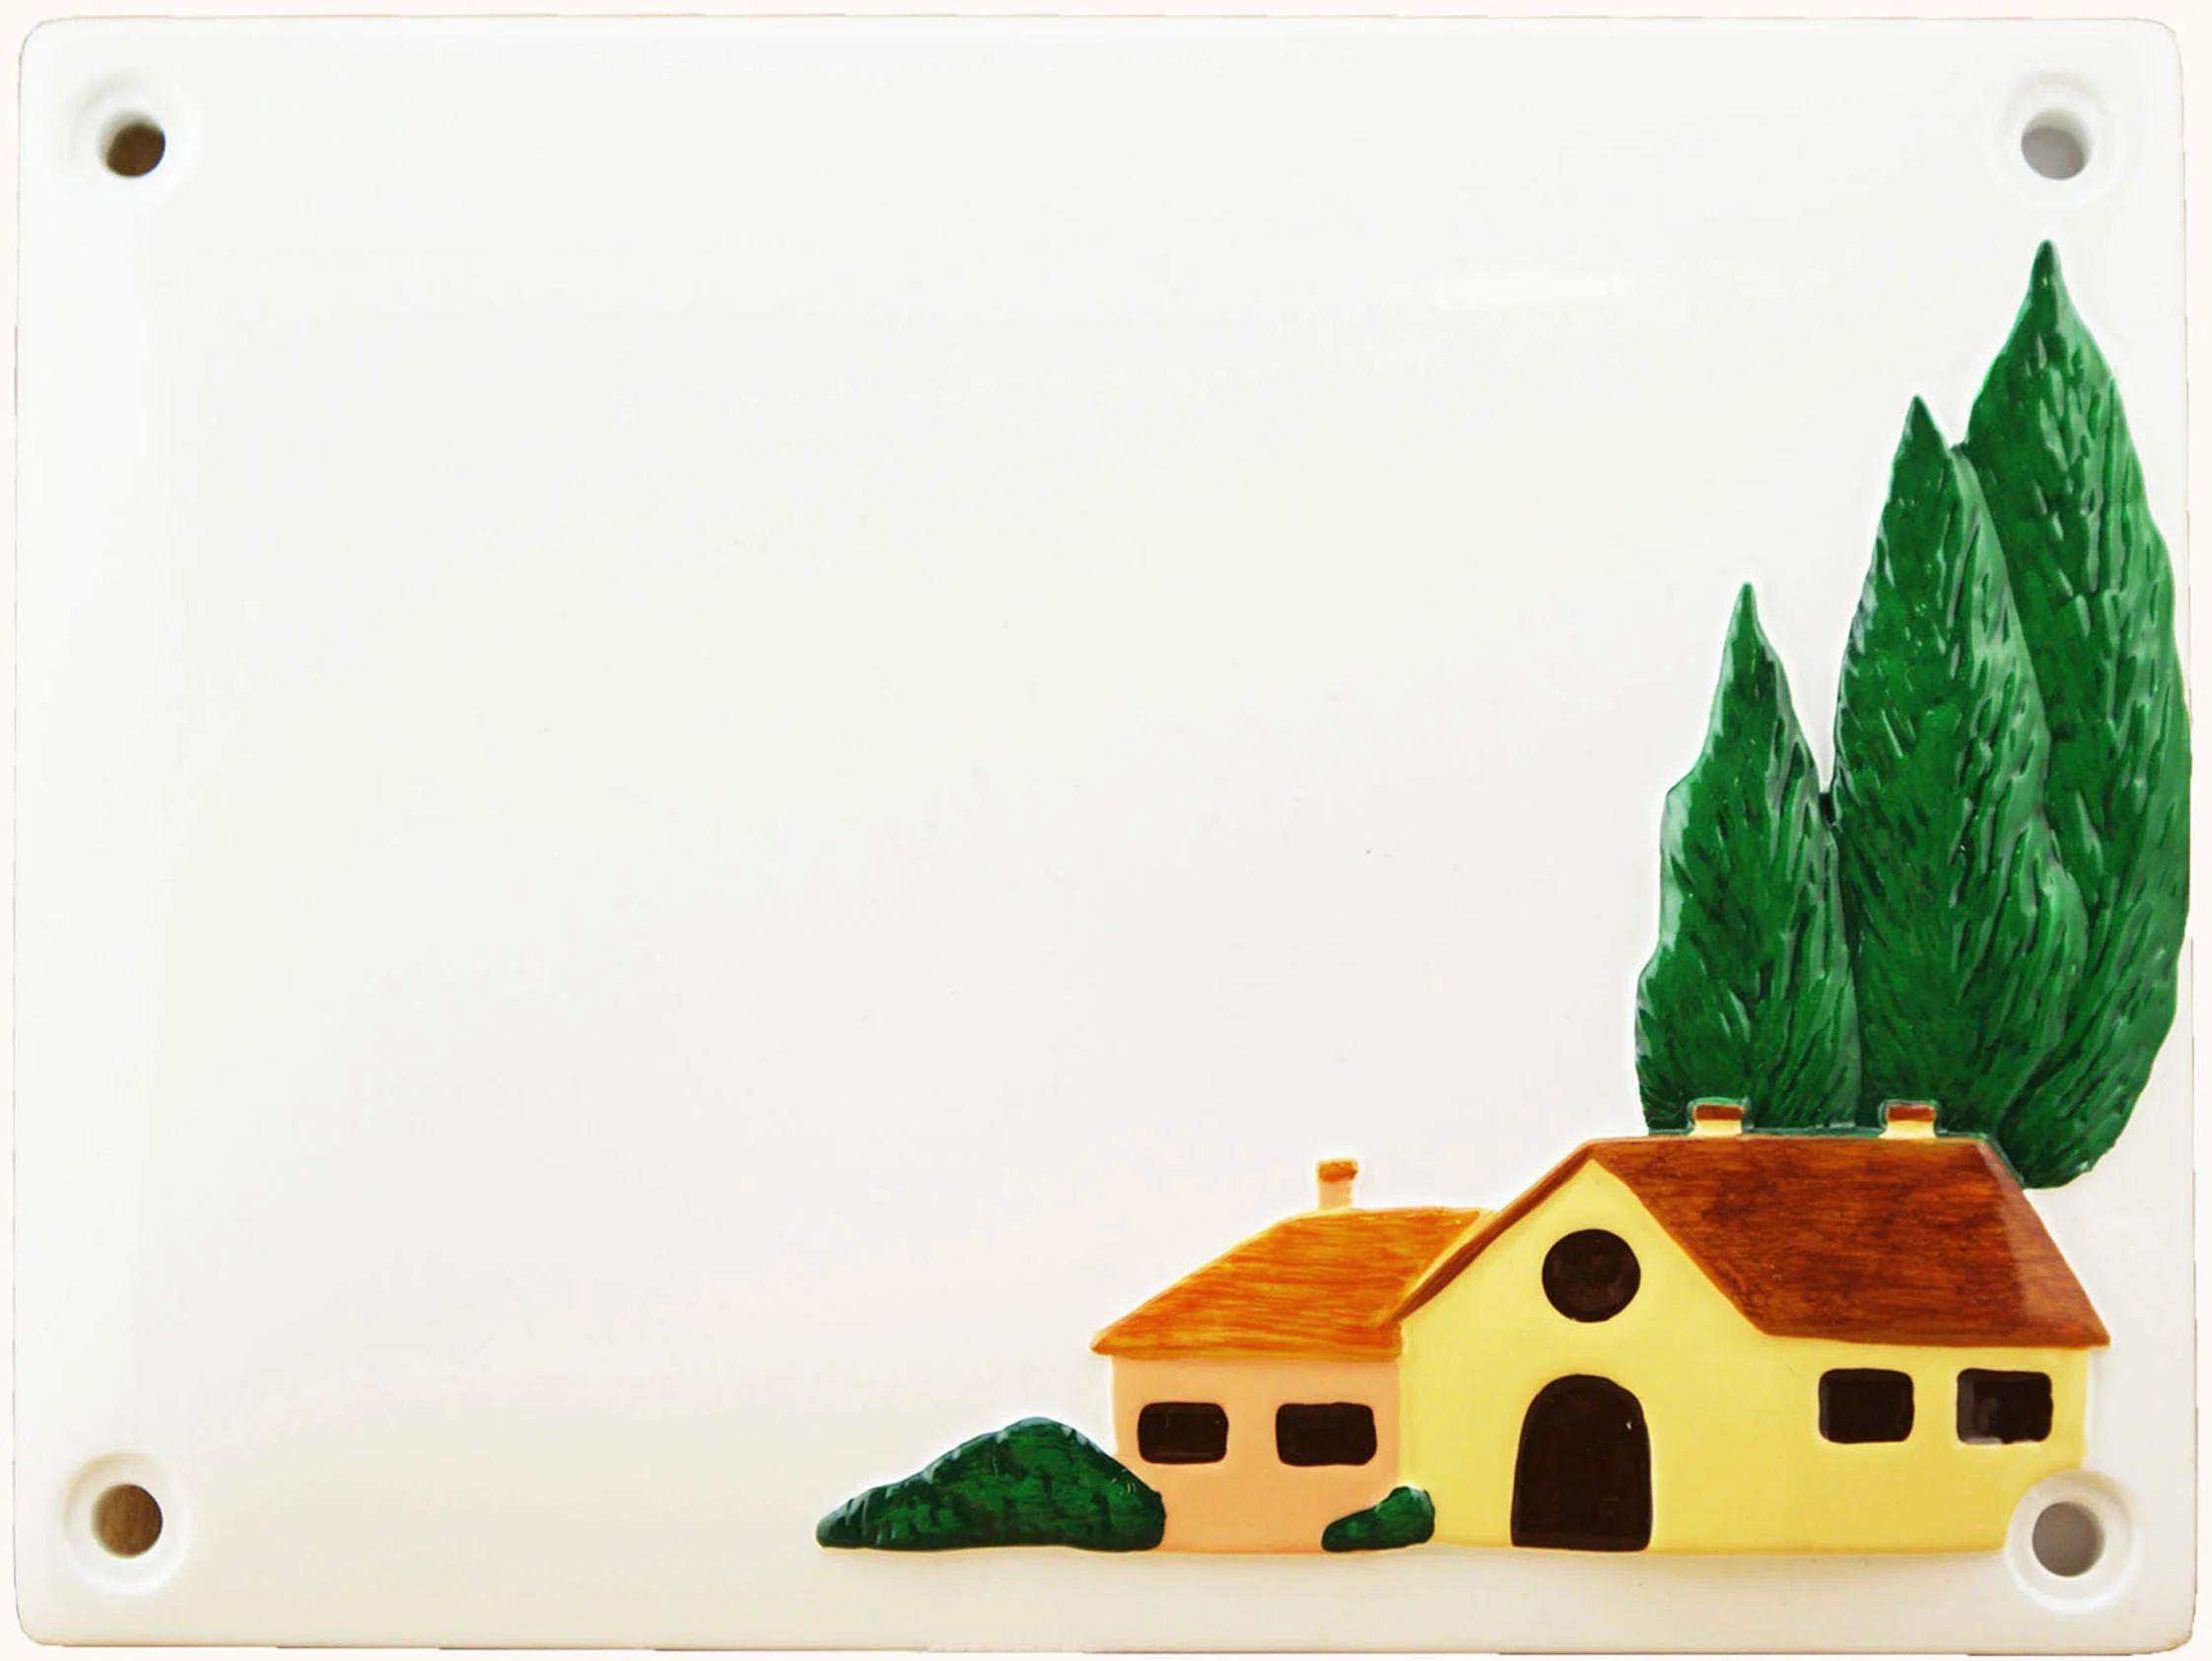 Plaque Maisons En Resine Leroy Merlin